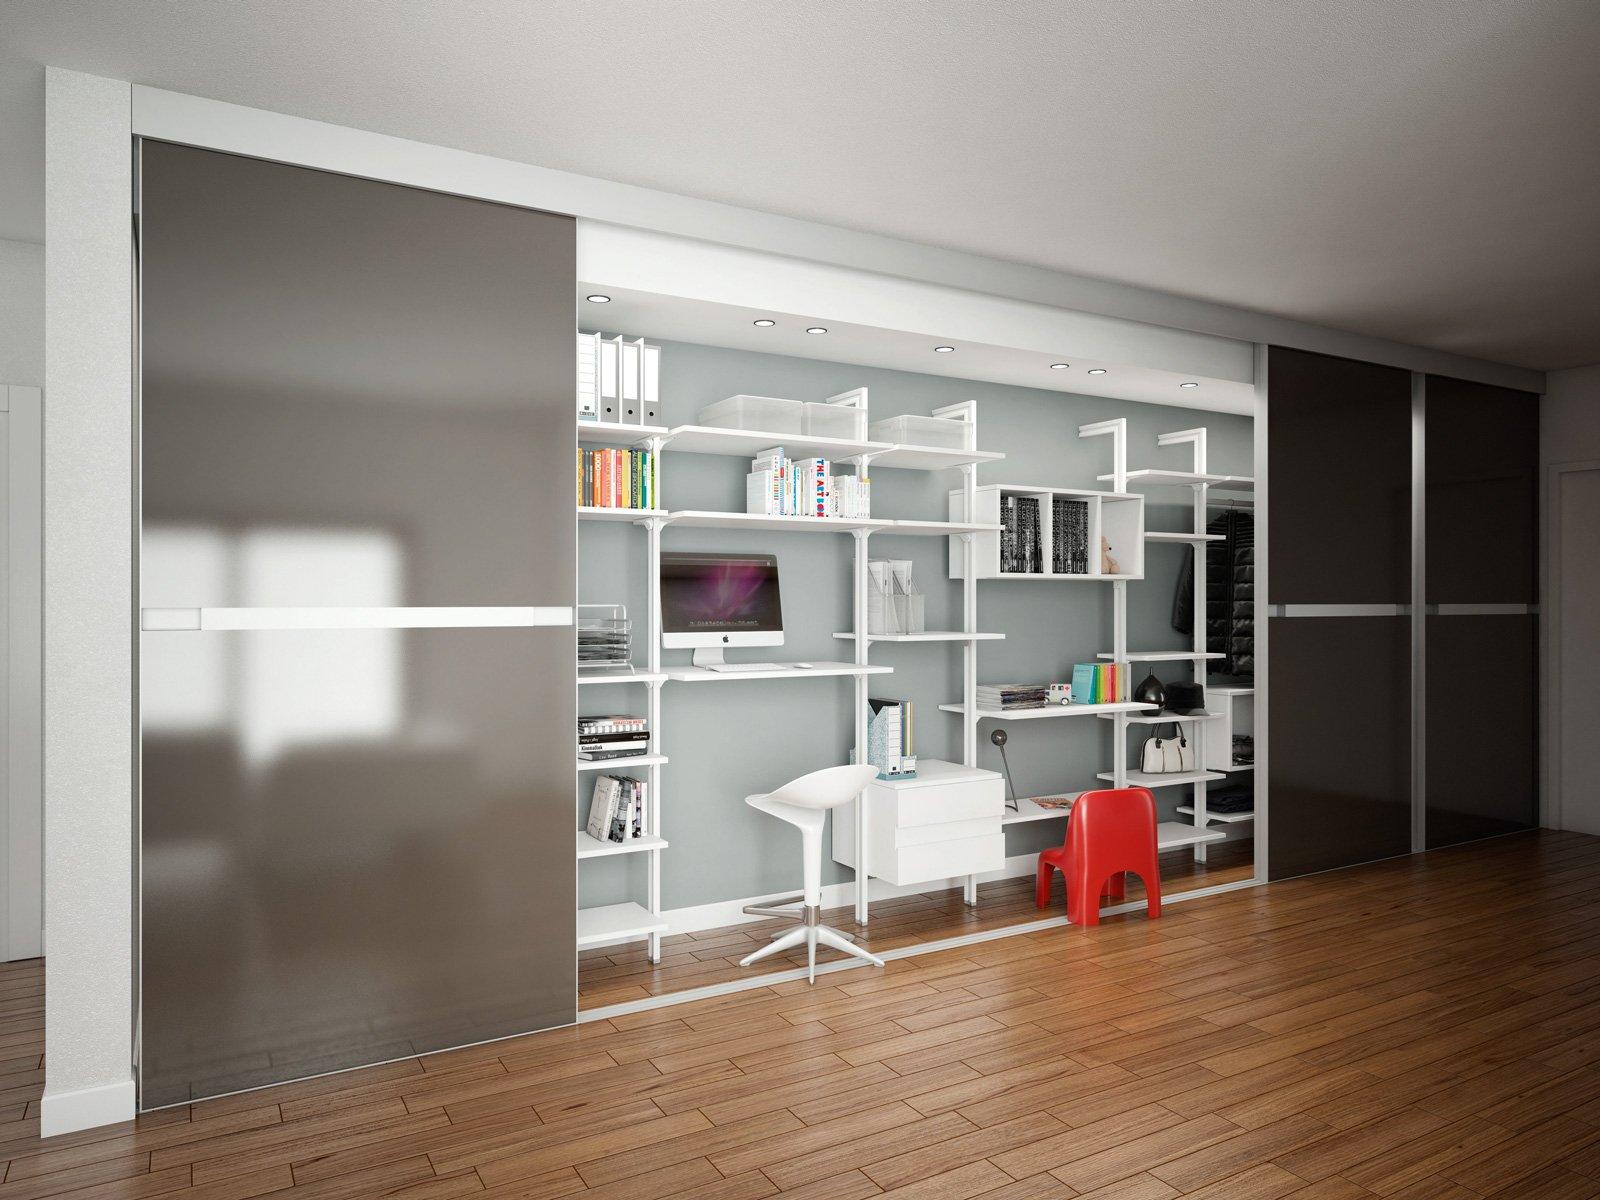 Librerie pareti attrezzate multifunzione cose di casa for Leroy merlin pittura pareti